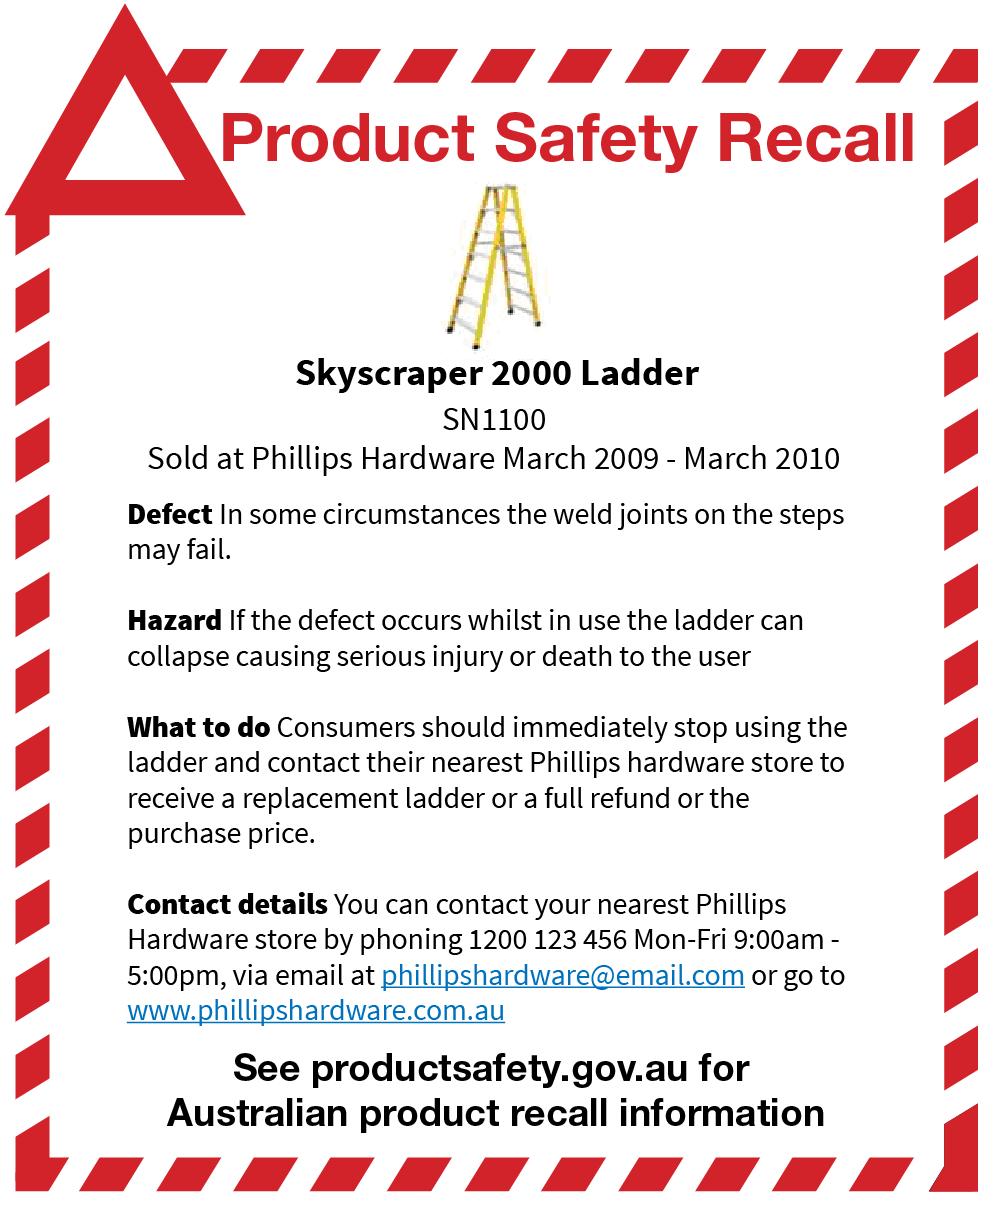 Sample recall notice